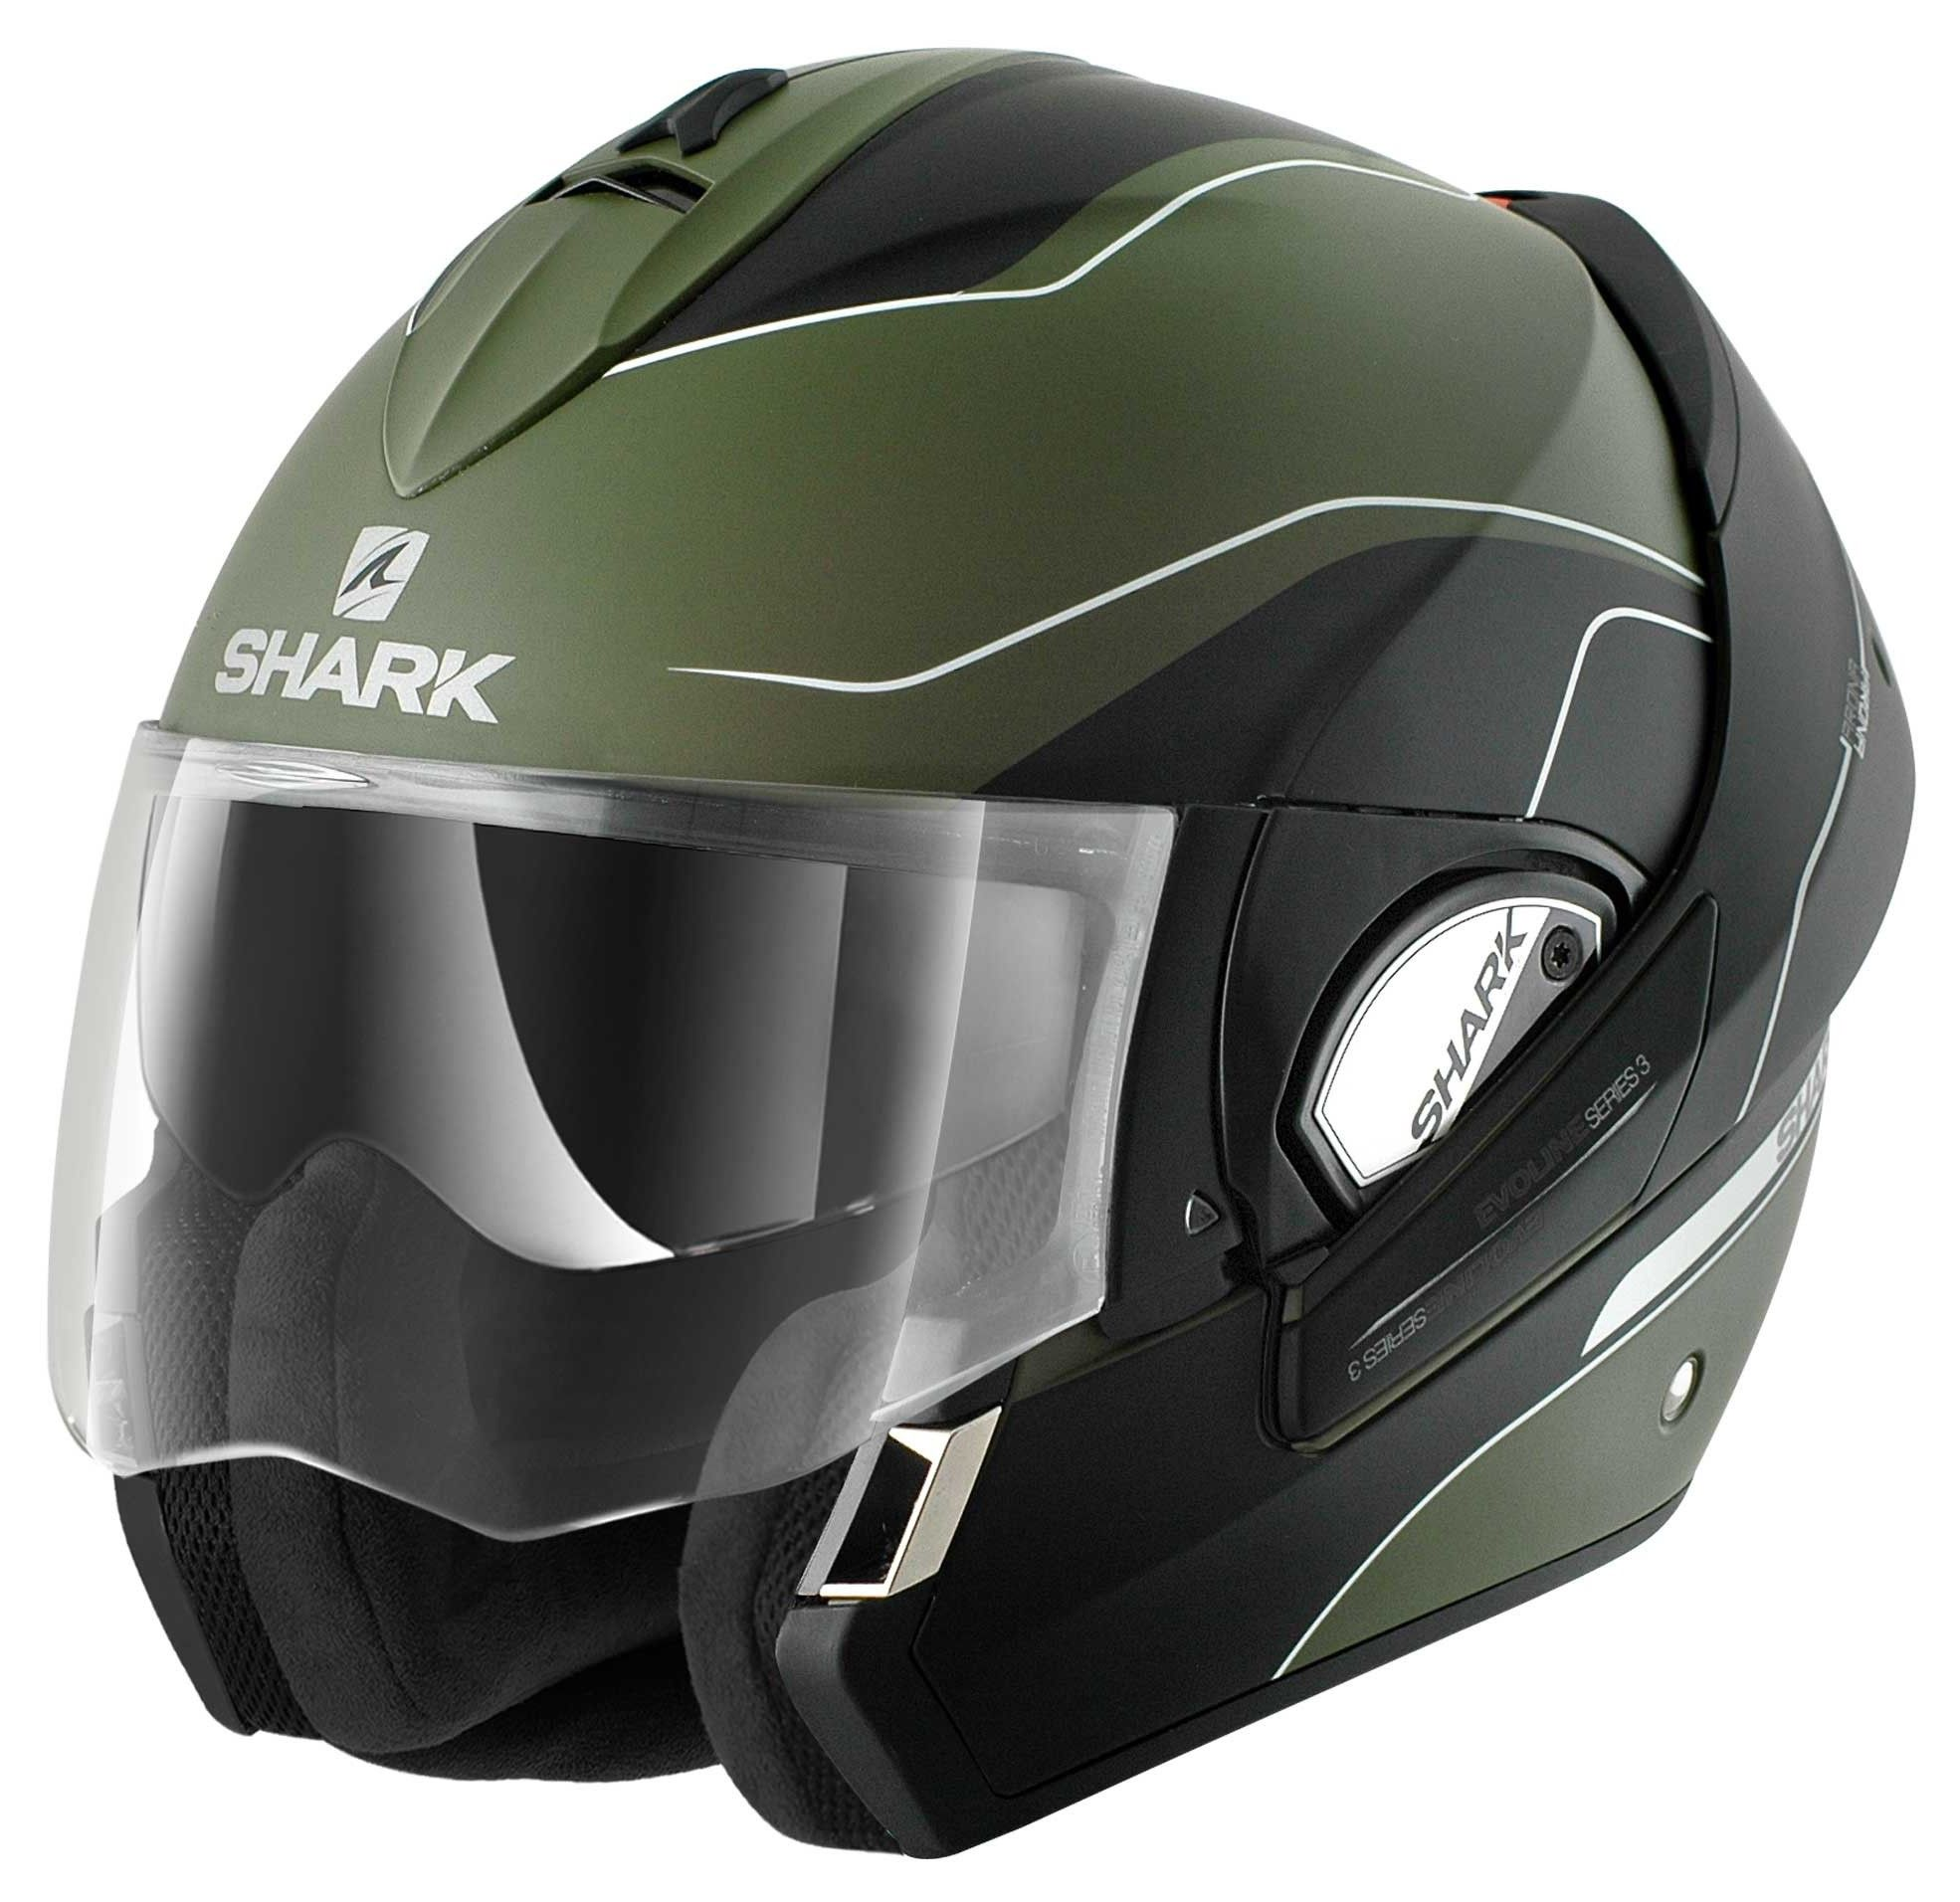 shark evoline 3 st arona helmet size sm only cycle gear. Black Bedroom Furniture Sets. Home Design Ideas